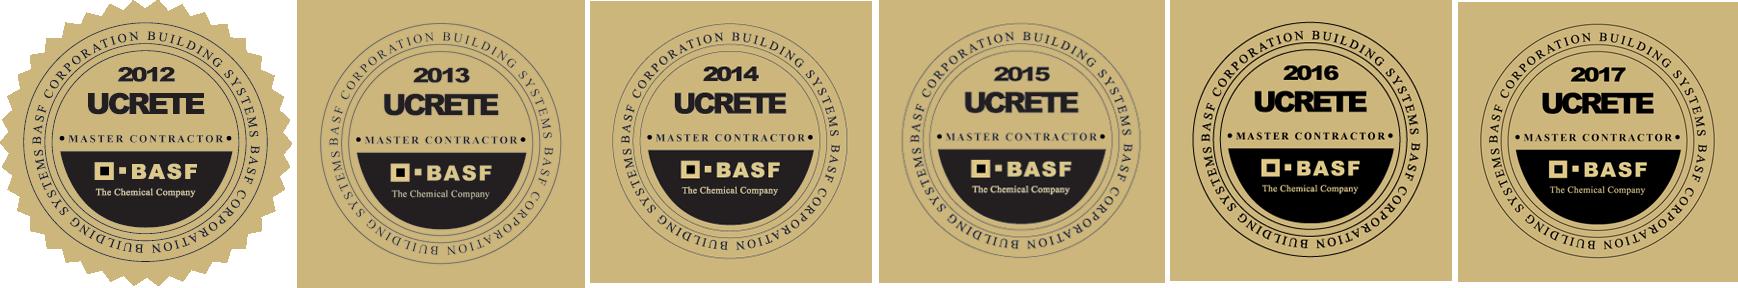 Affiliations Certifcations Basf Ucrete Tennant Ucrete Pip